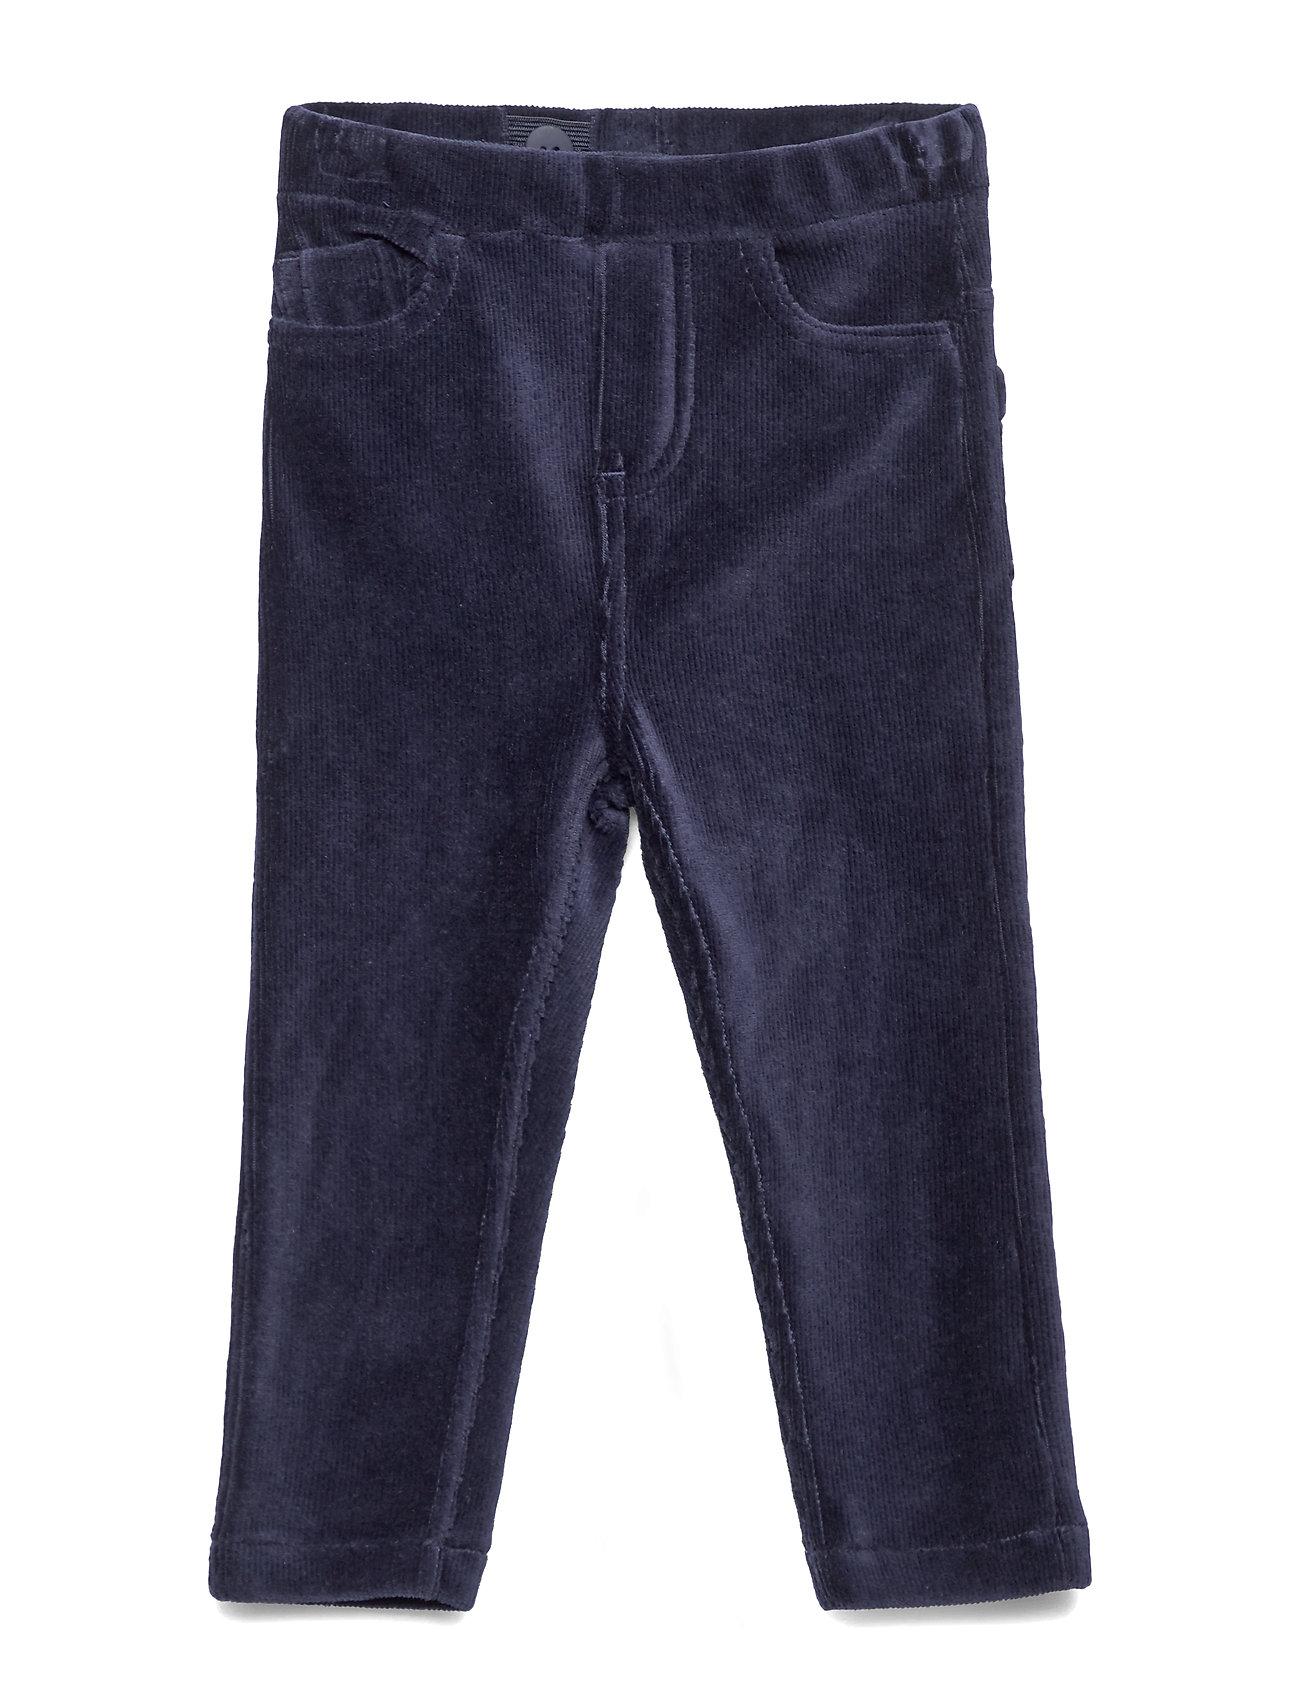 Polarn O. Pyret Jersey cord trousers Preschool - DARK SAPPHIRE